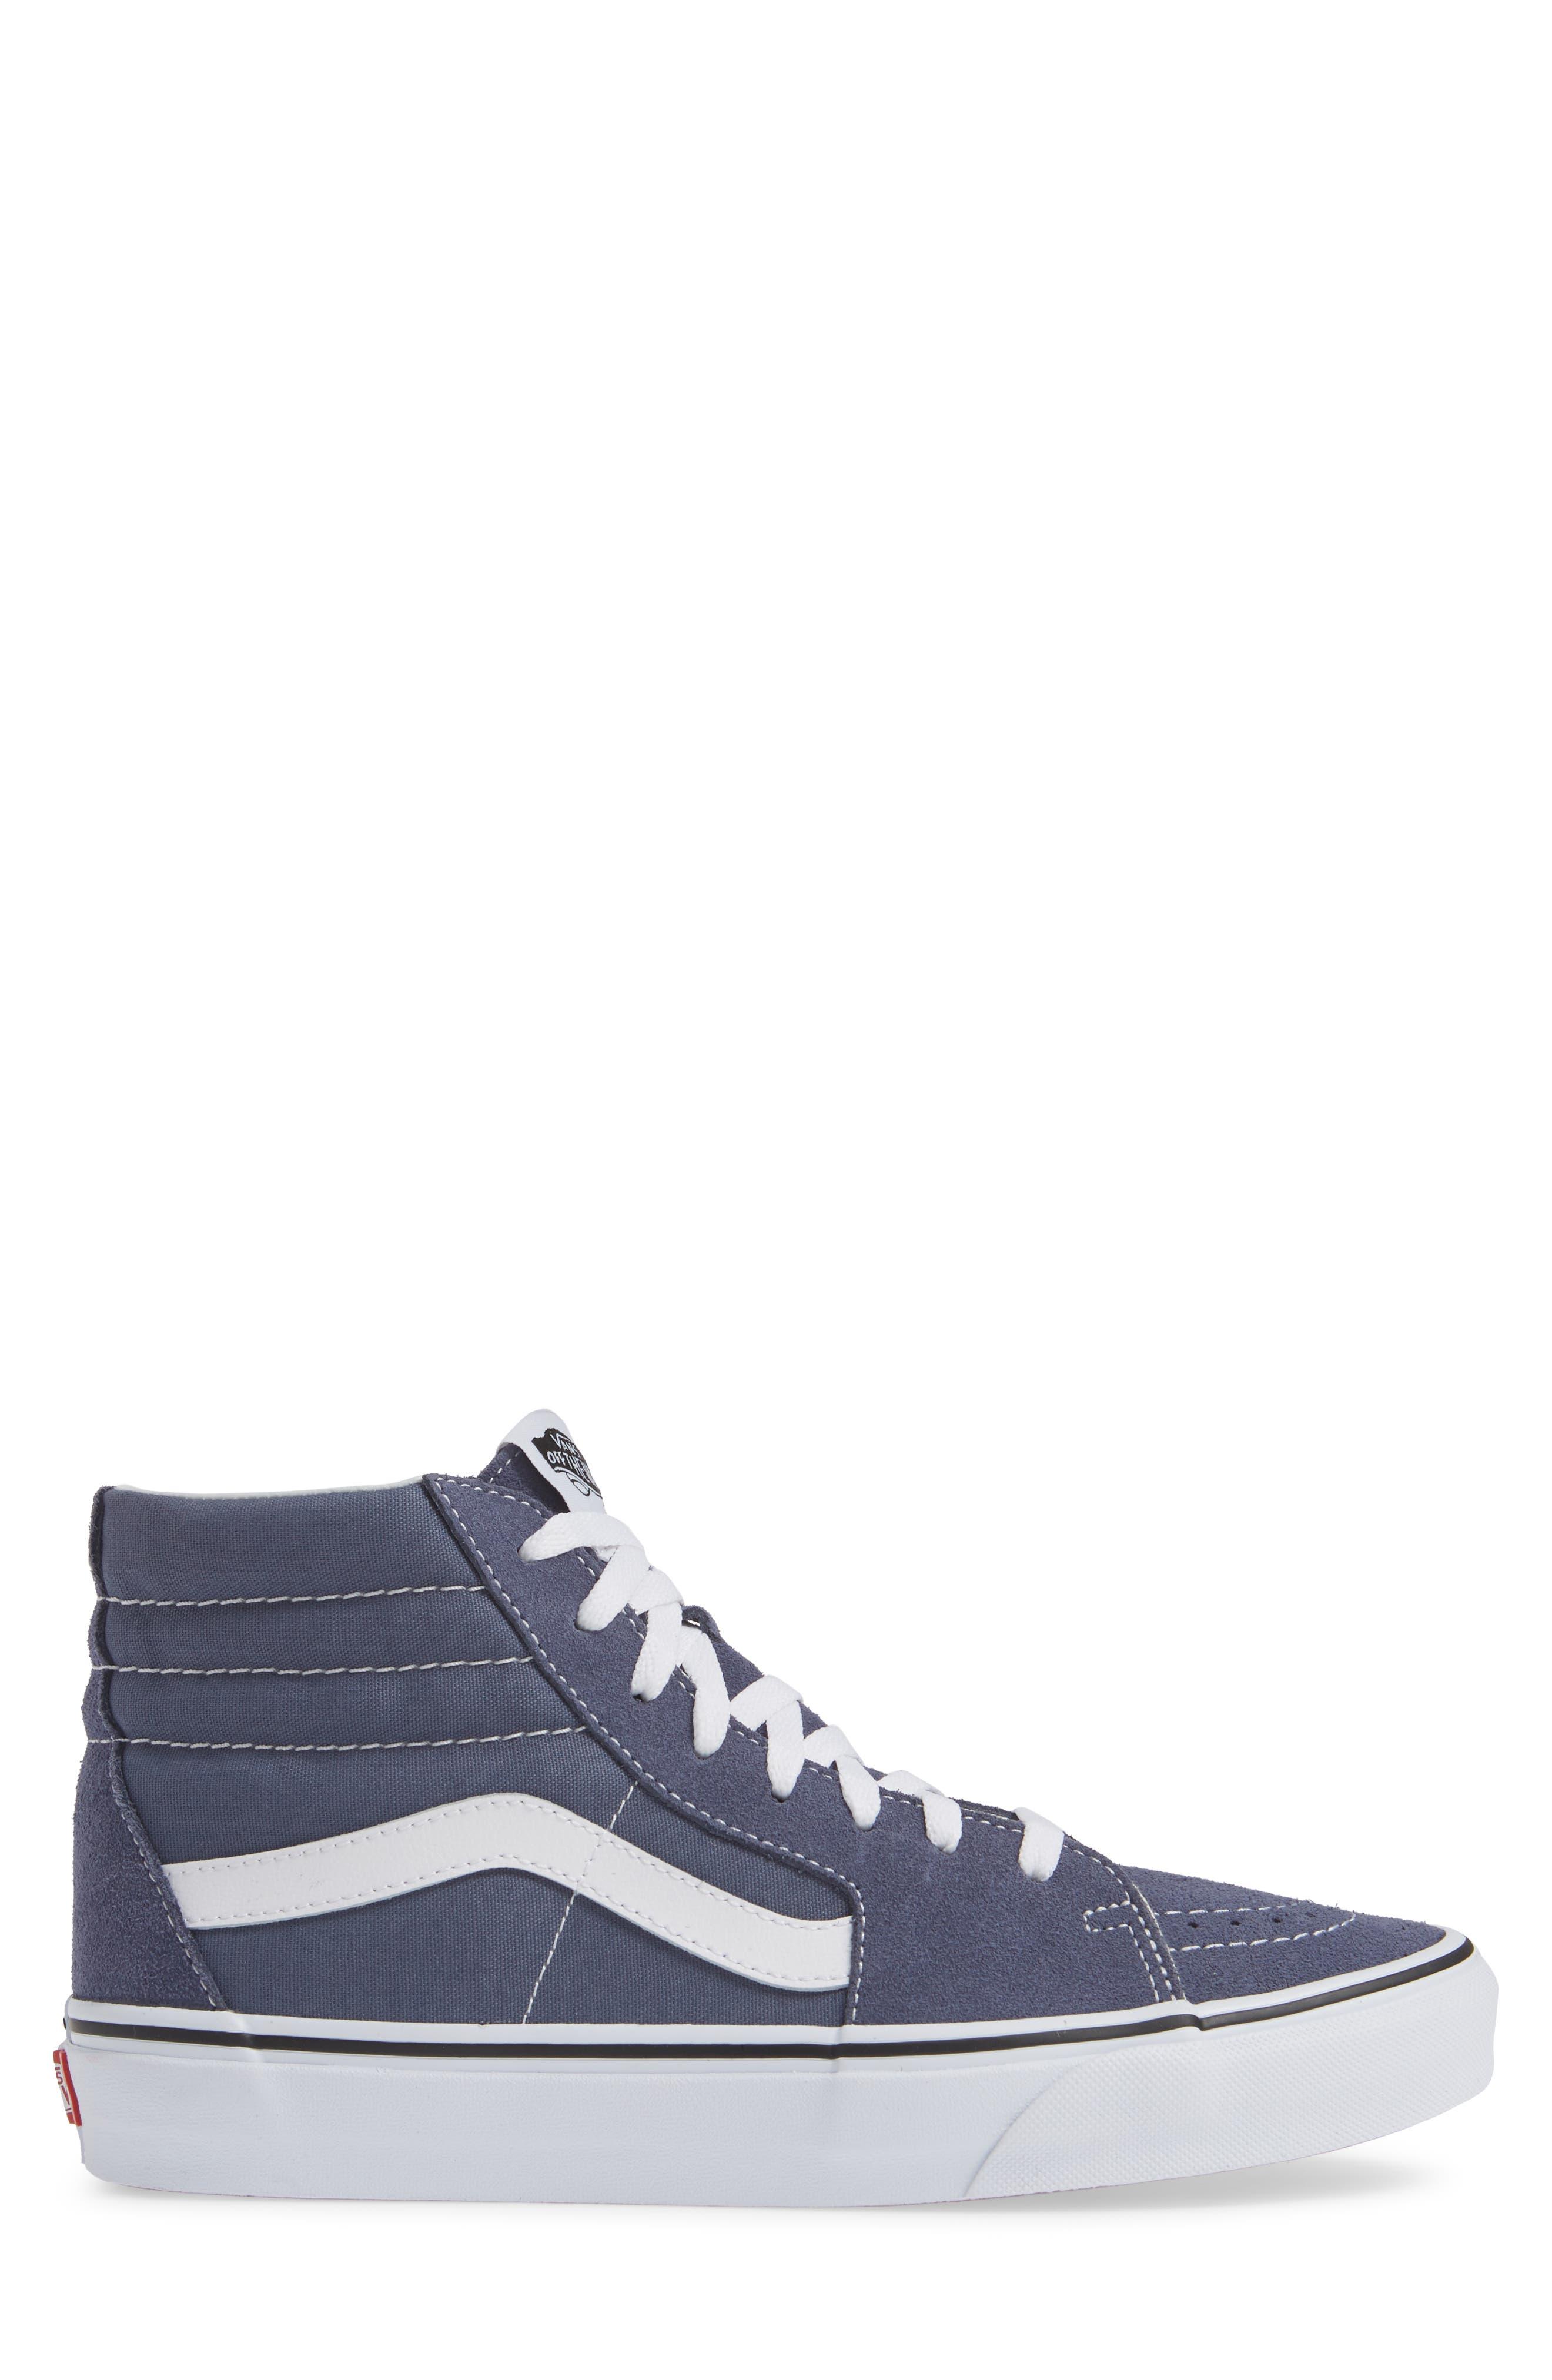 'Sk8-Hi' Sneaker,                             Alternate thumbnail 3, color,                             GREY/ TRUE WHITE